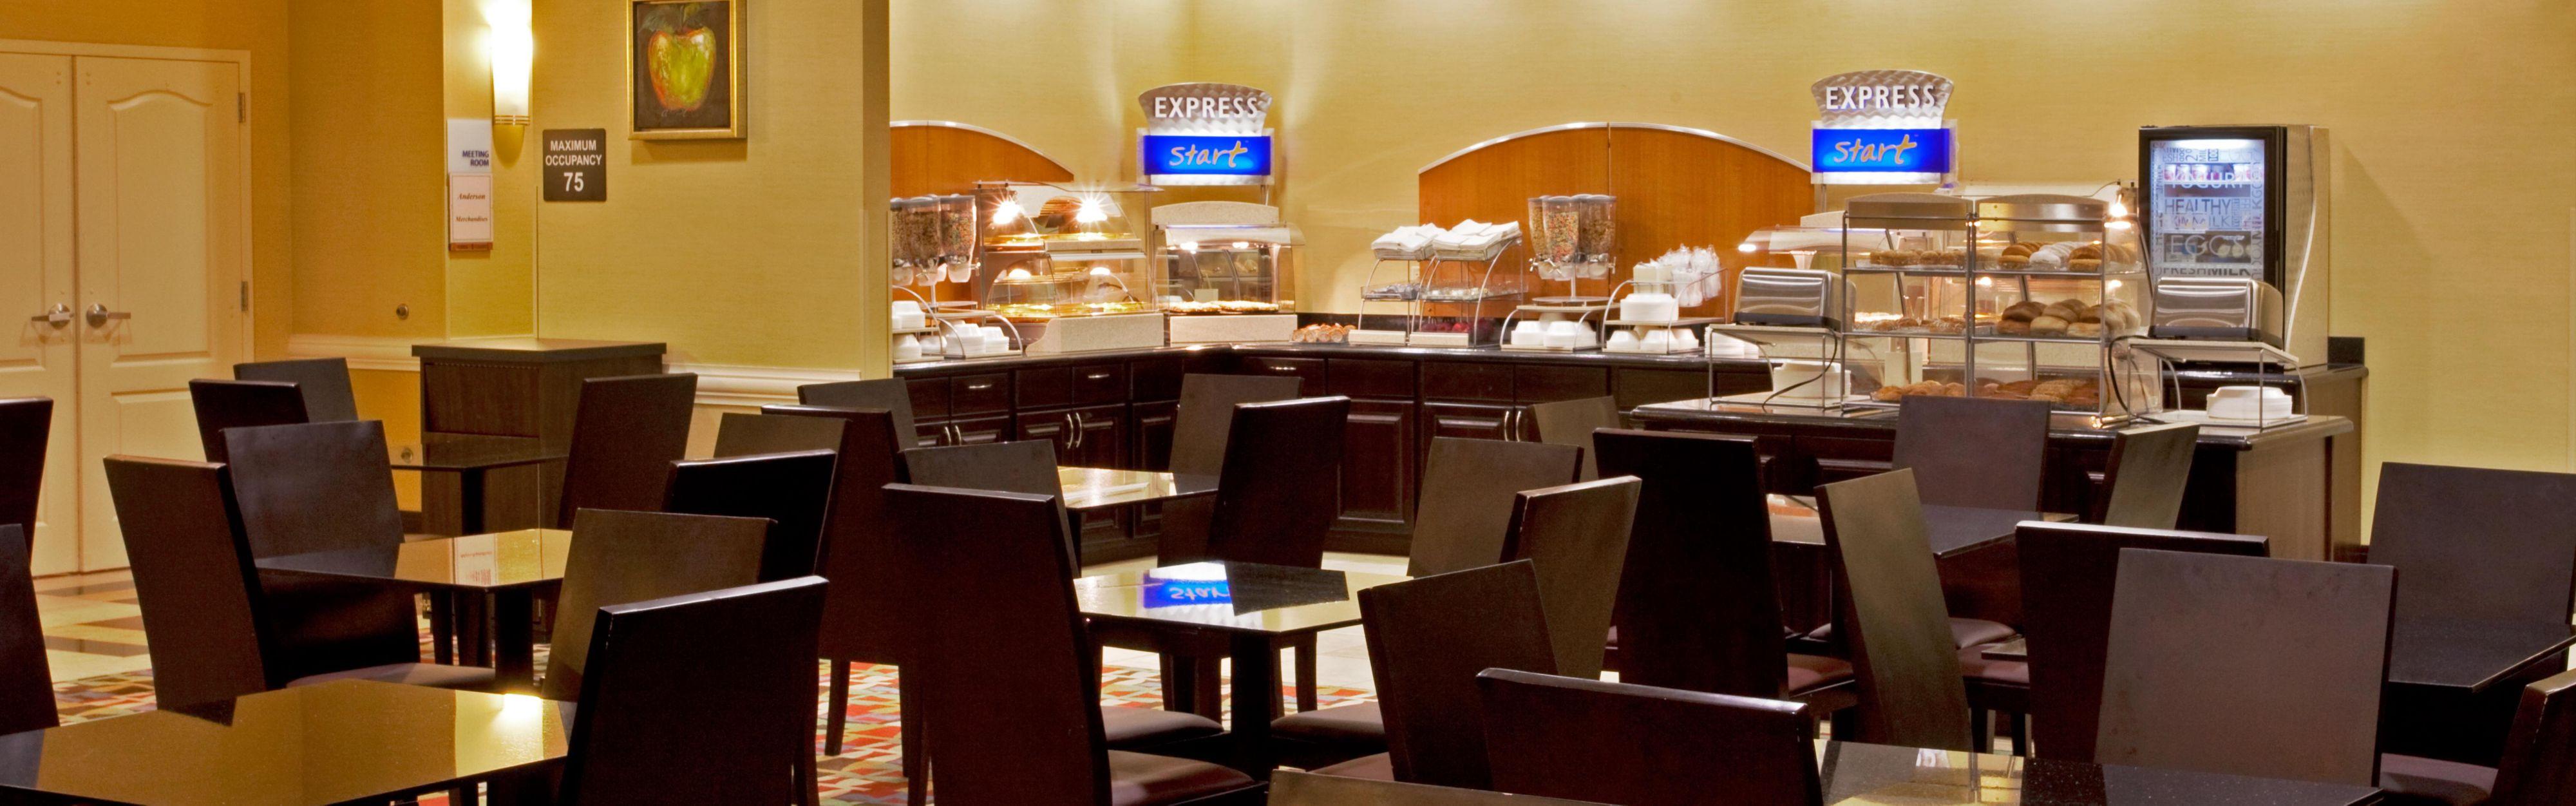 Holiday Inn Express & Suites Orlando - International Drive image 3